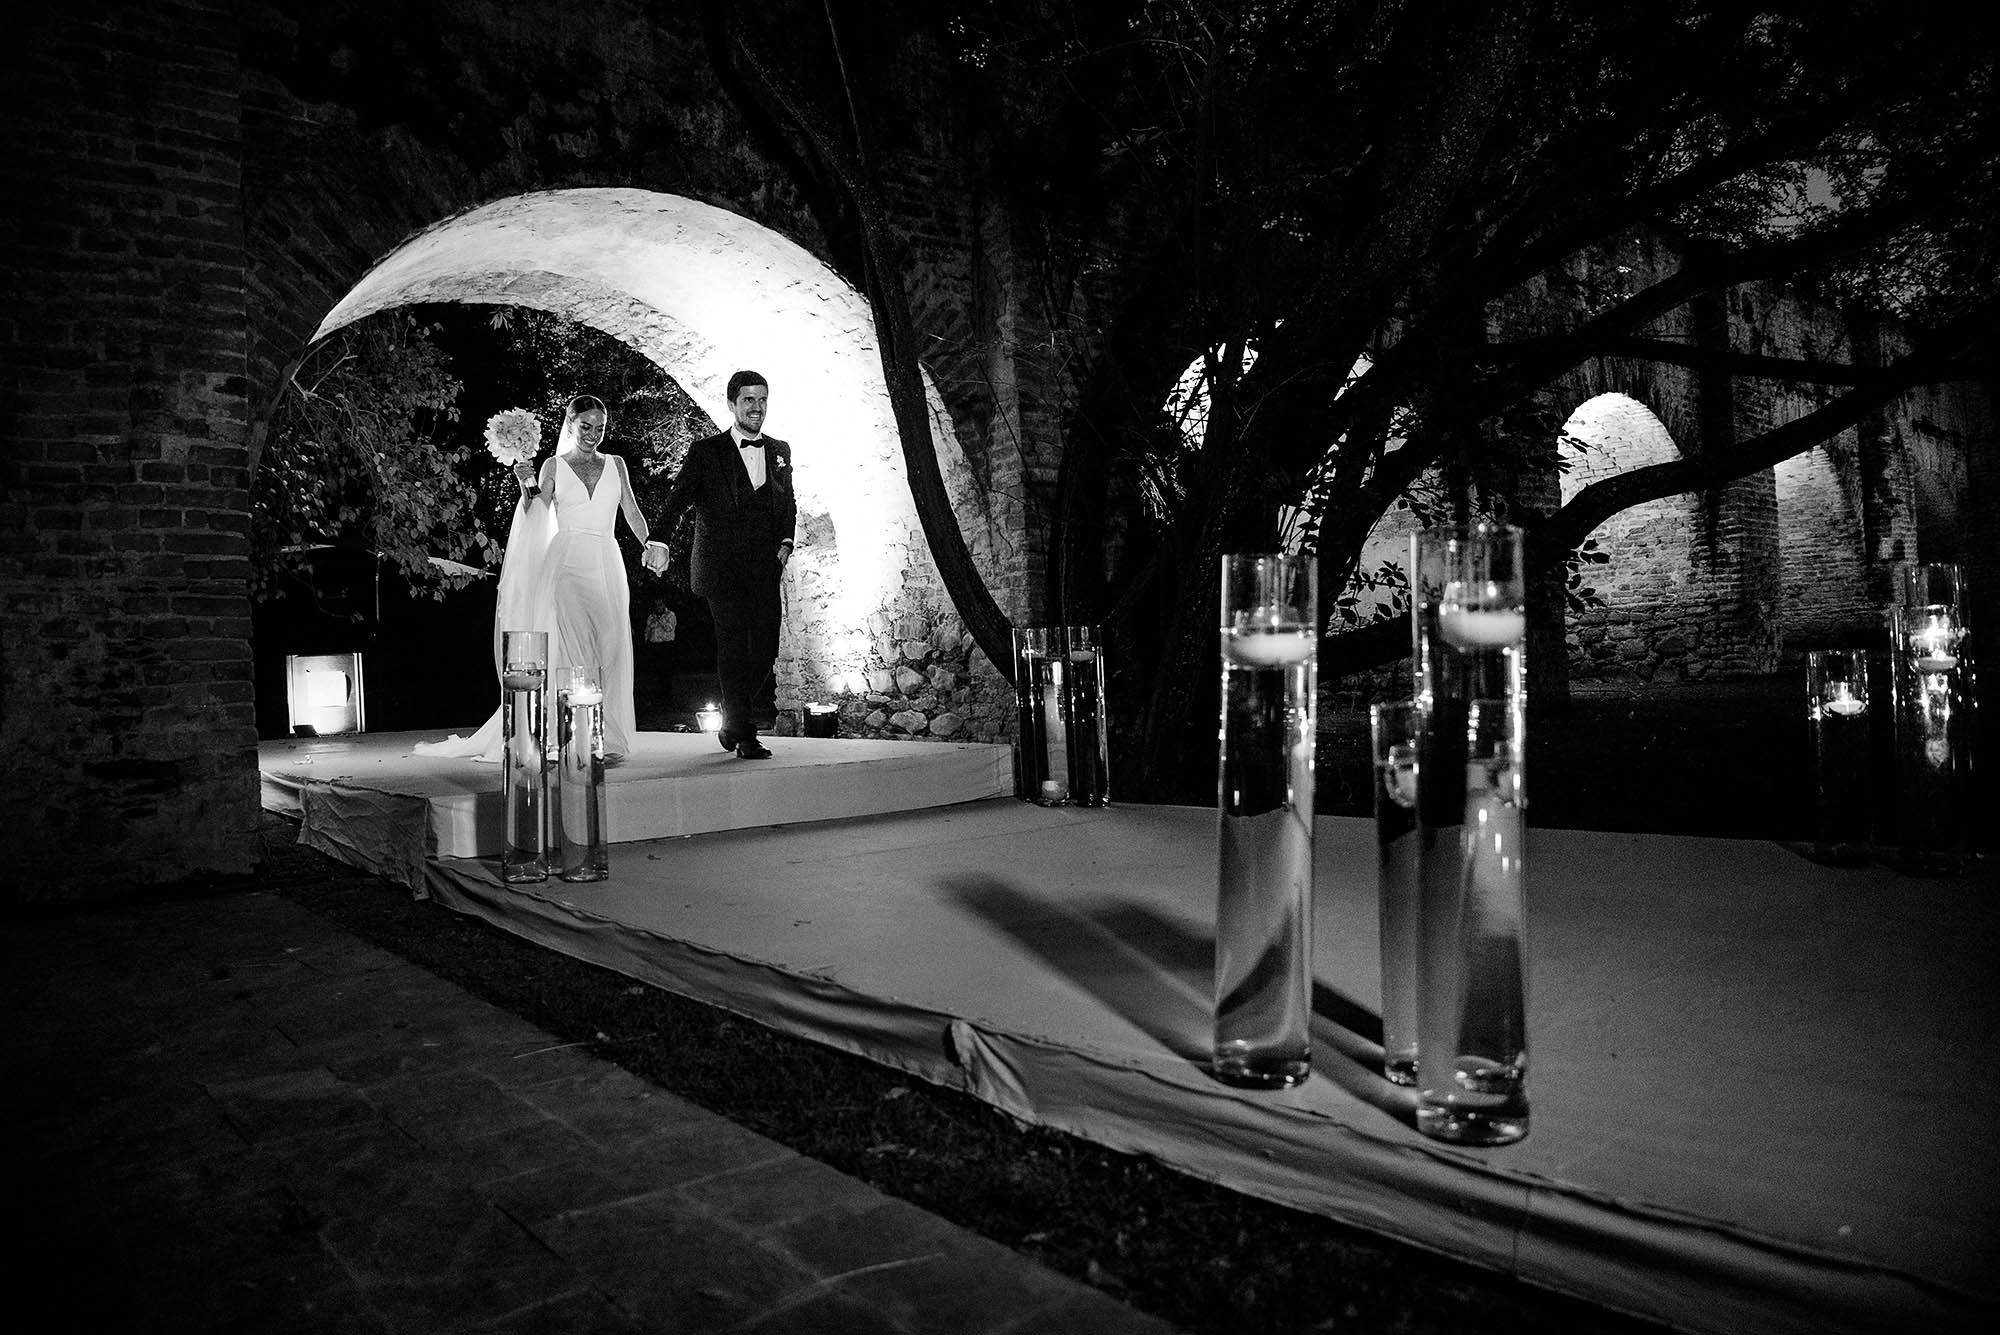 magali fotografo hacienda escoba guadalajara boda wedding 23.jpg